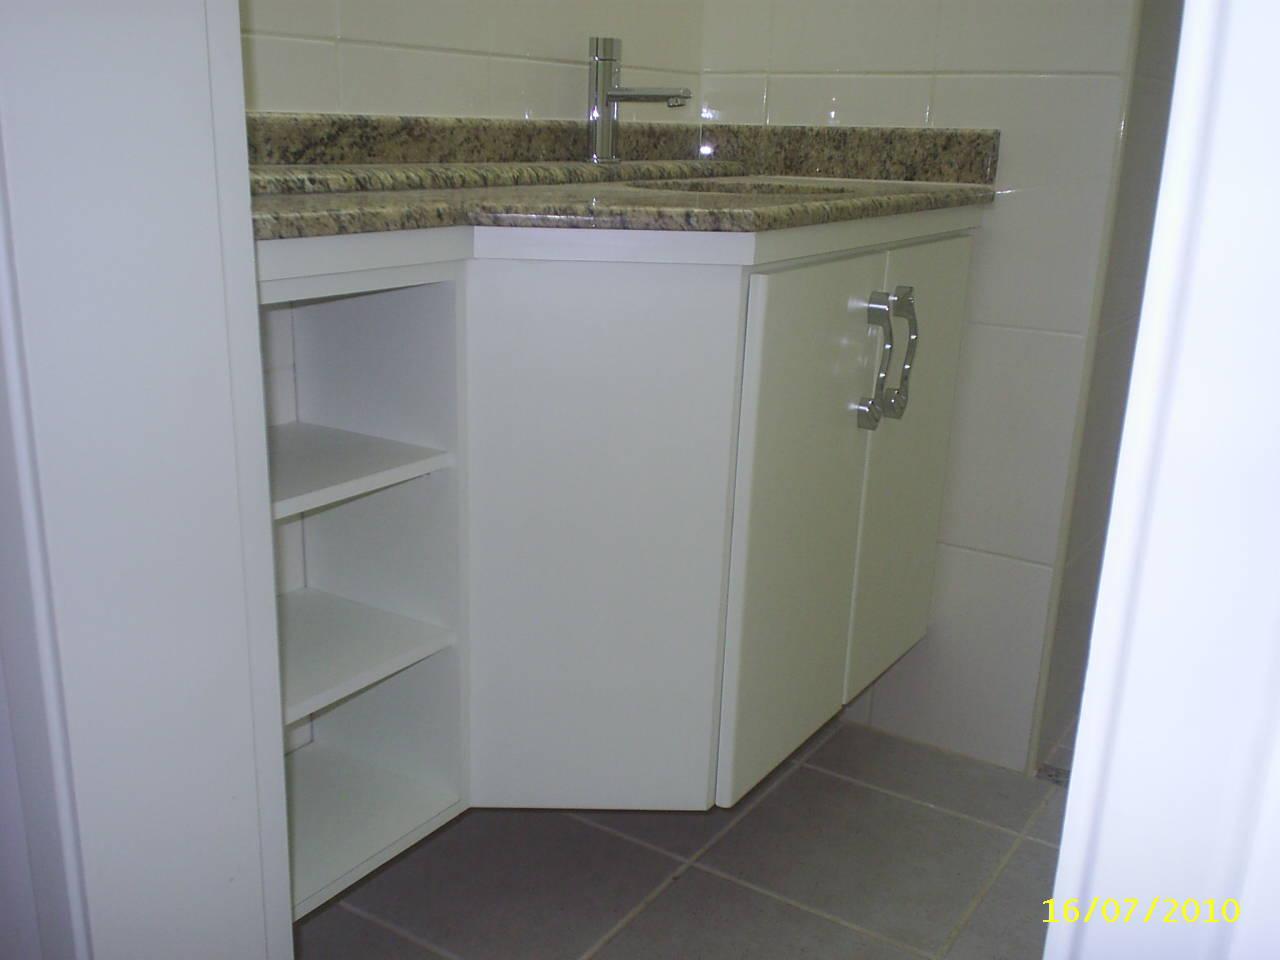 Gabinete Para Banheiro Imagens de gabinetes banheiro -> Gabinete De Banheiro Bumi